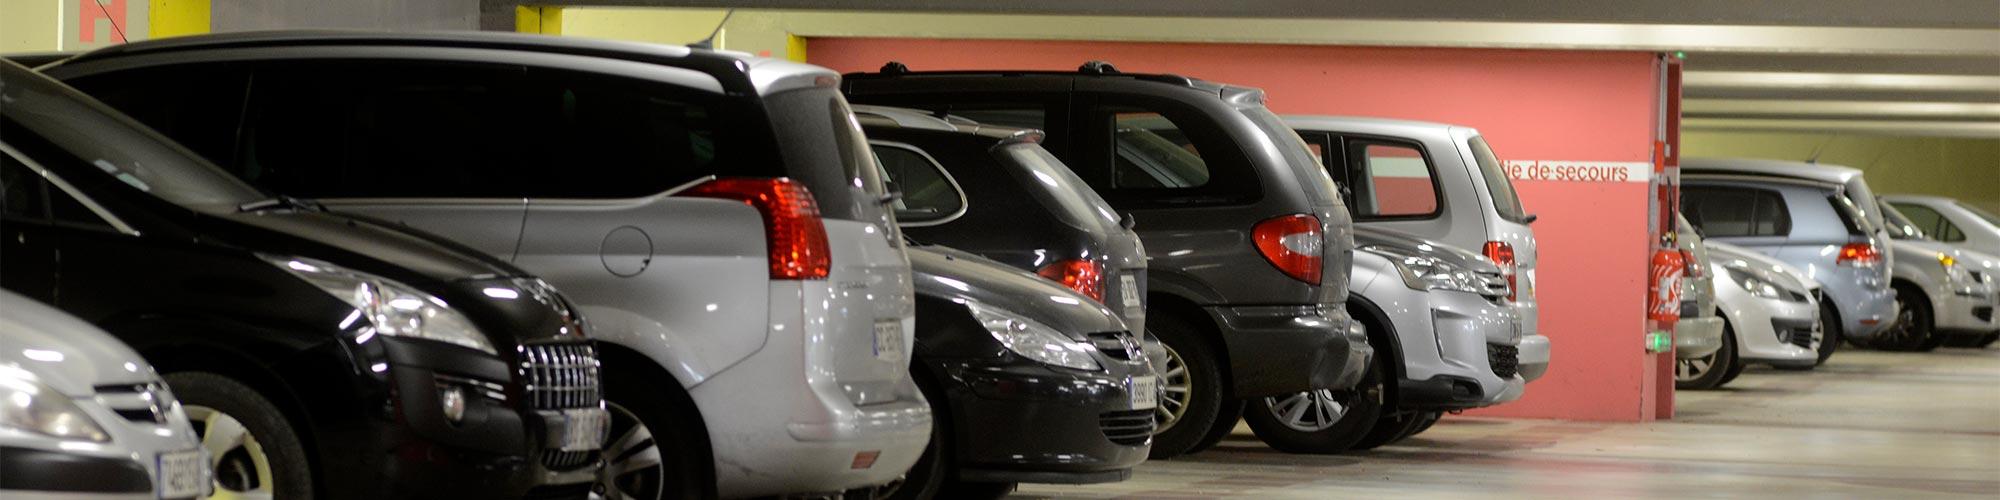 parking-saint-serge-49